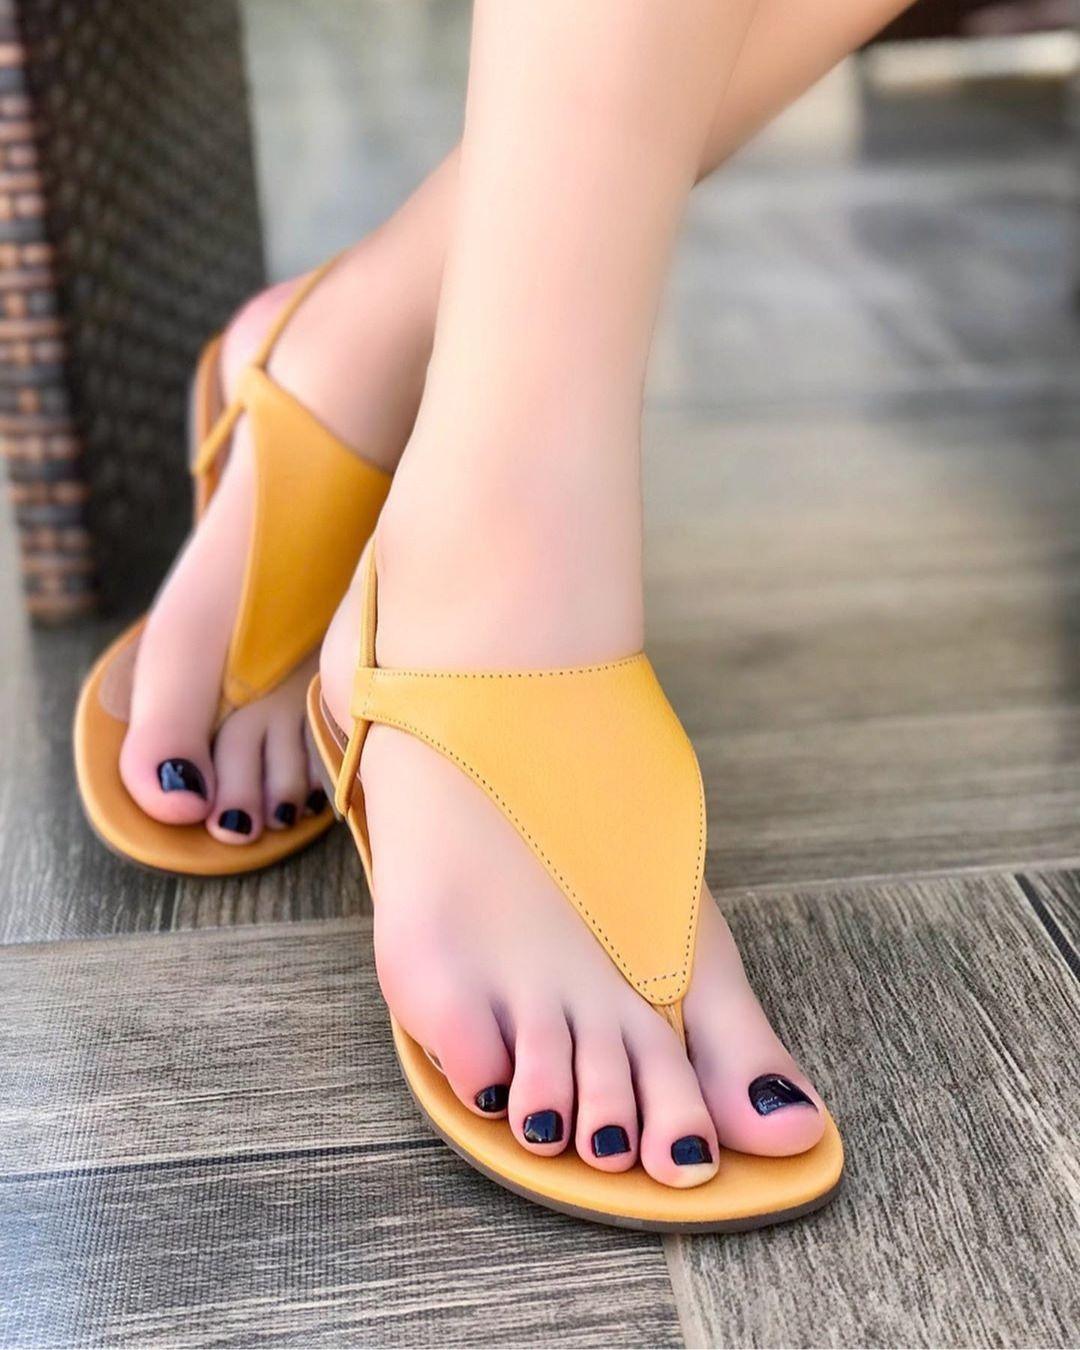 2 Girls Feet Humiliation